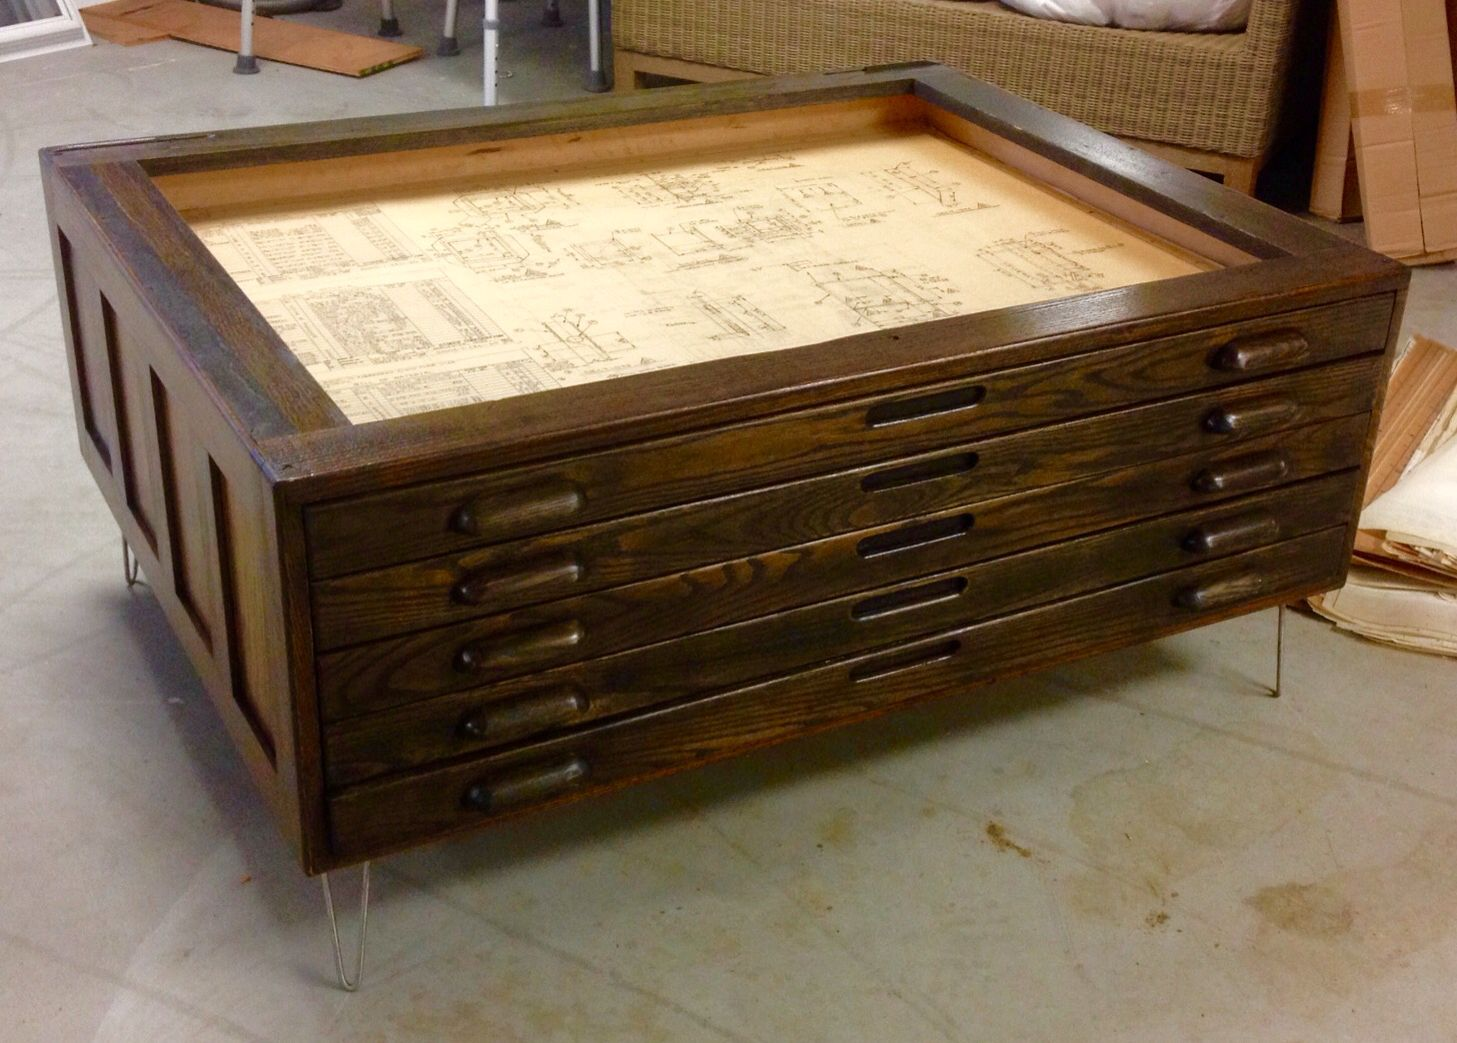 Repurposed Vintage Hamilton Flat Map Or Blueprint File Cabinet